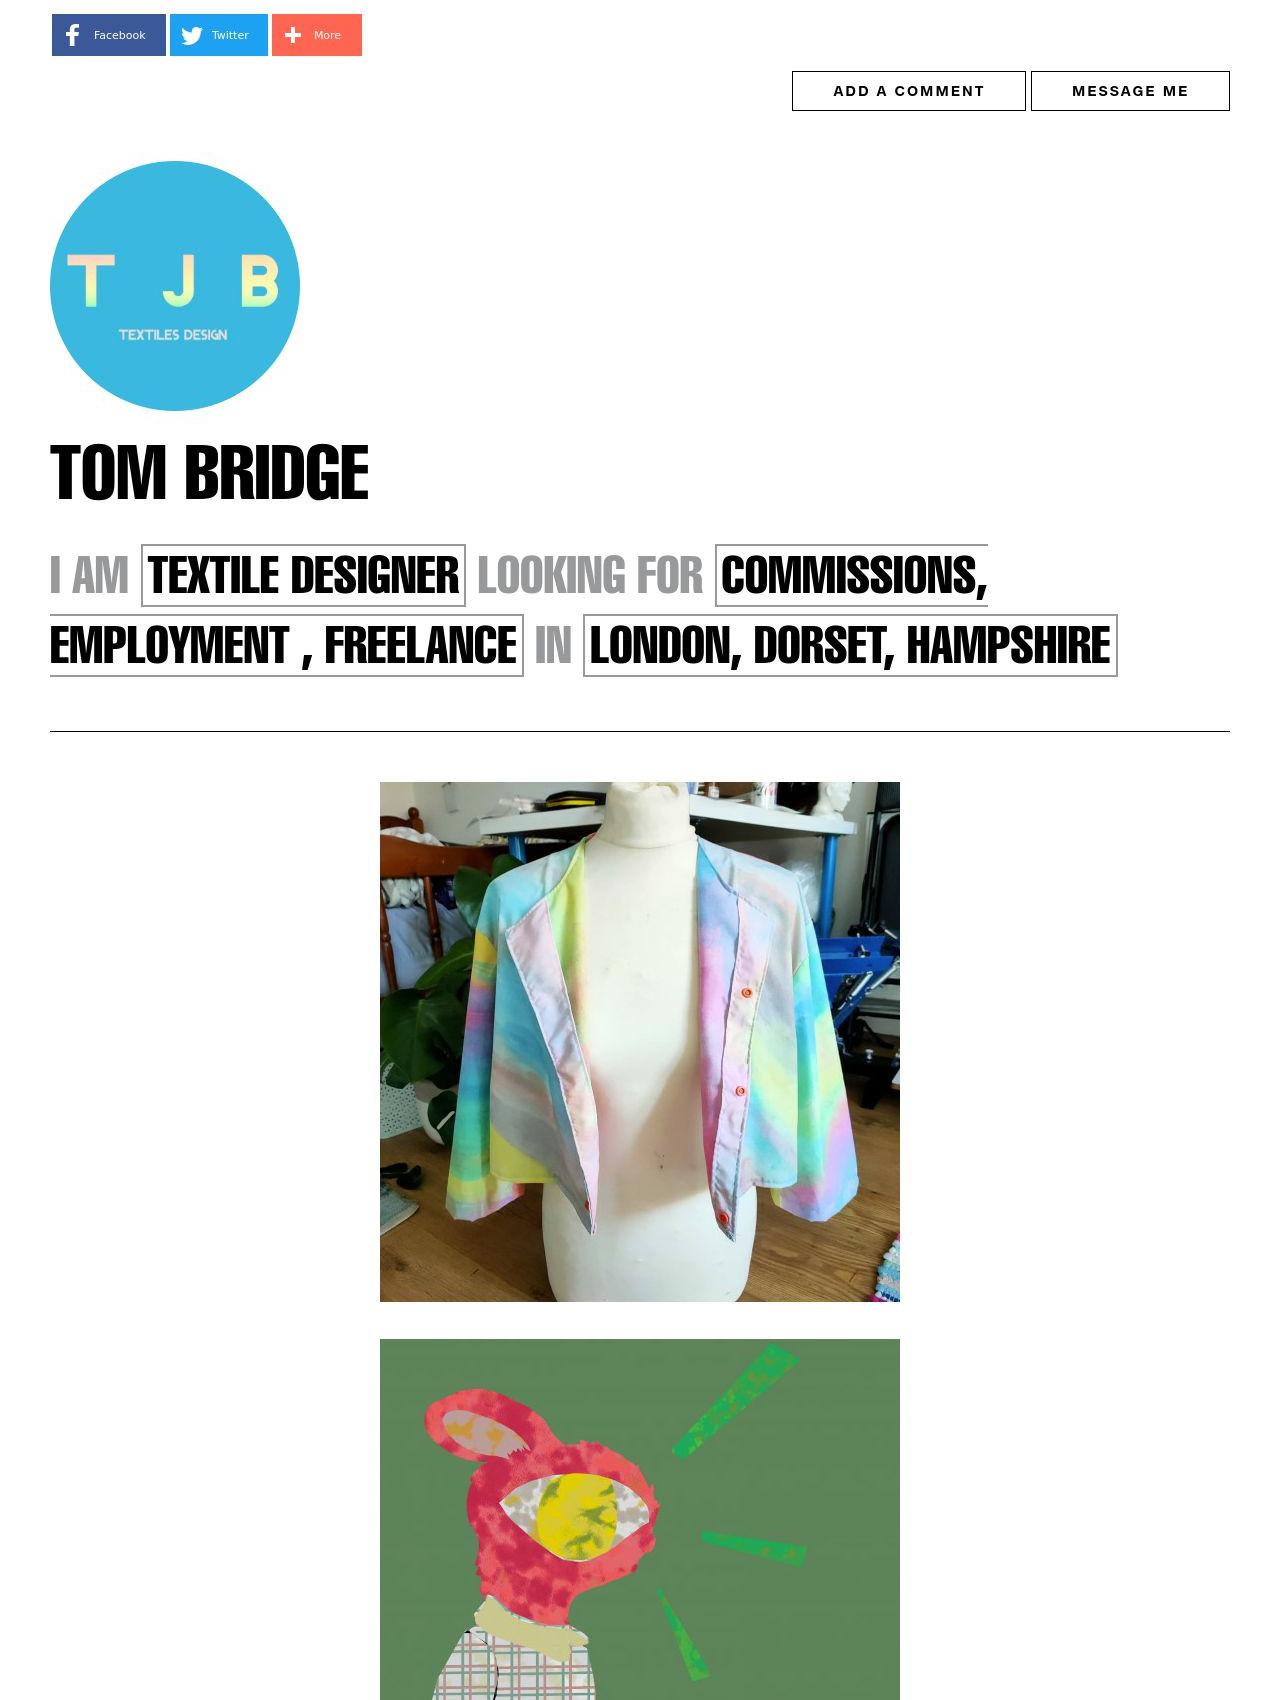 Tom Bridge